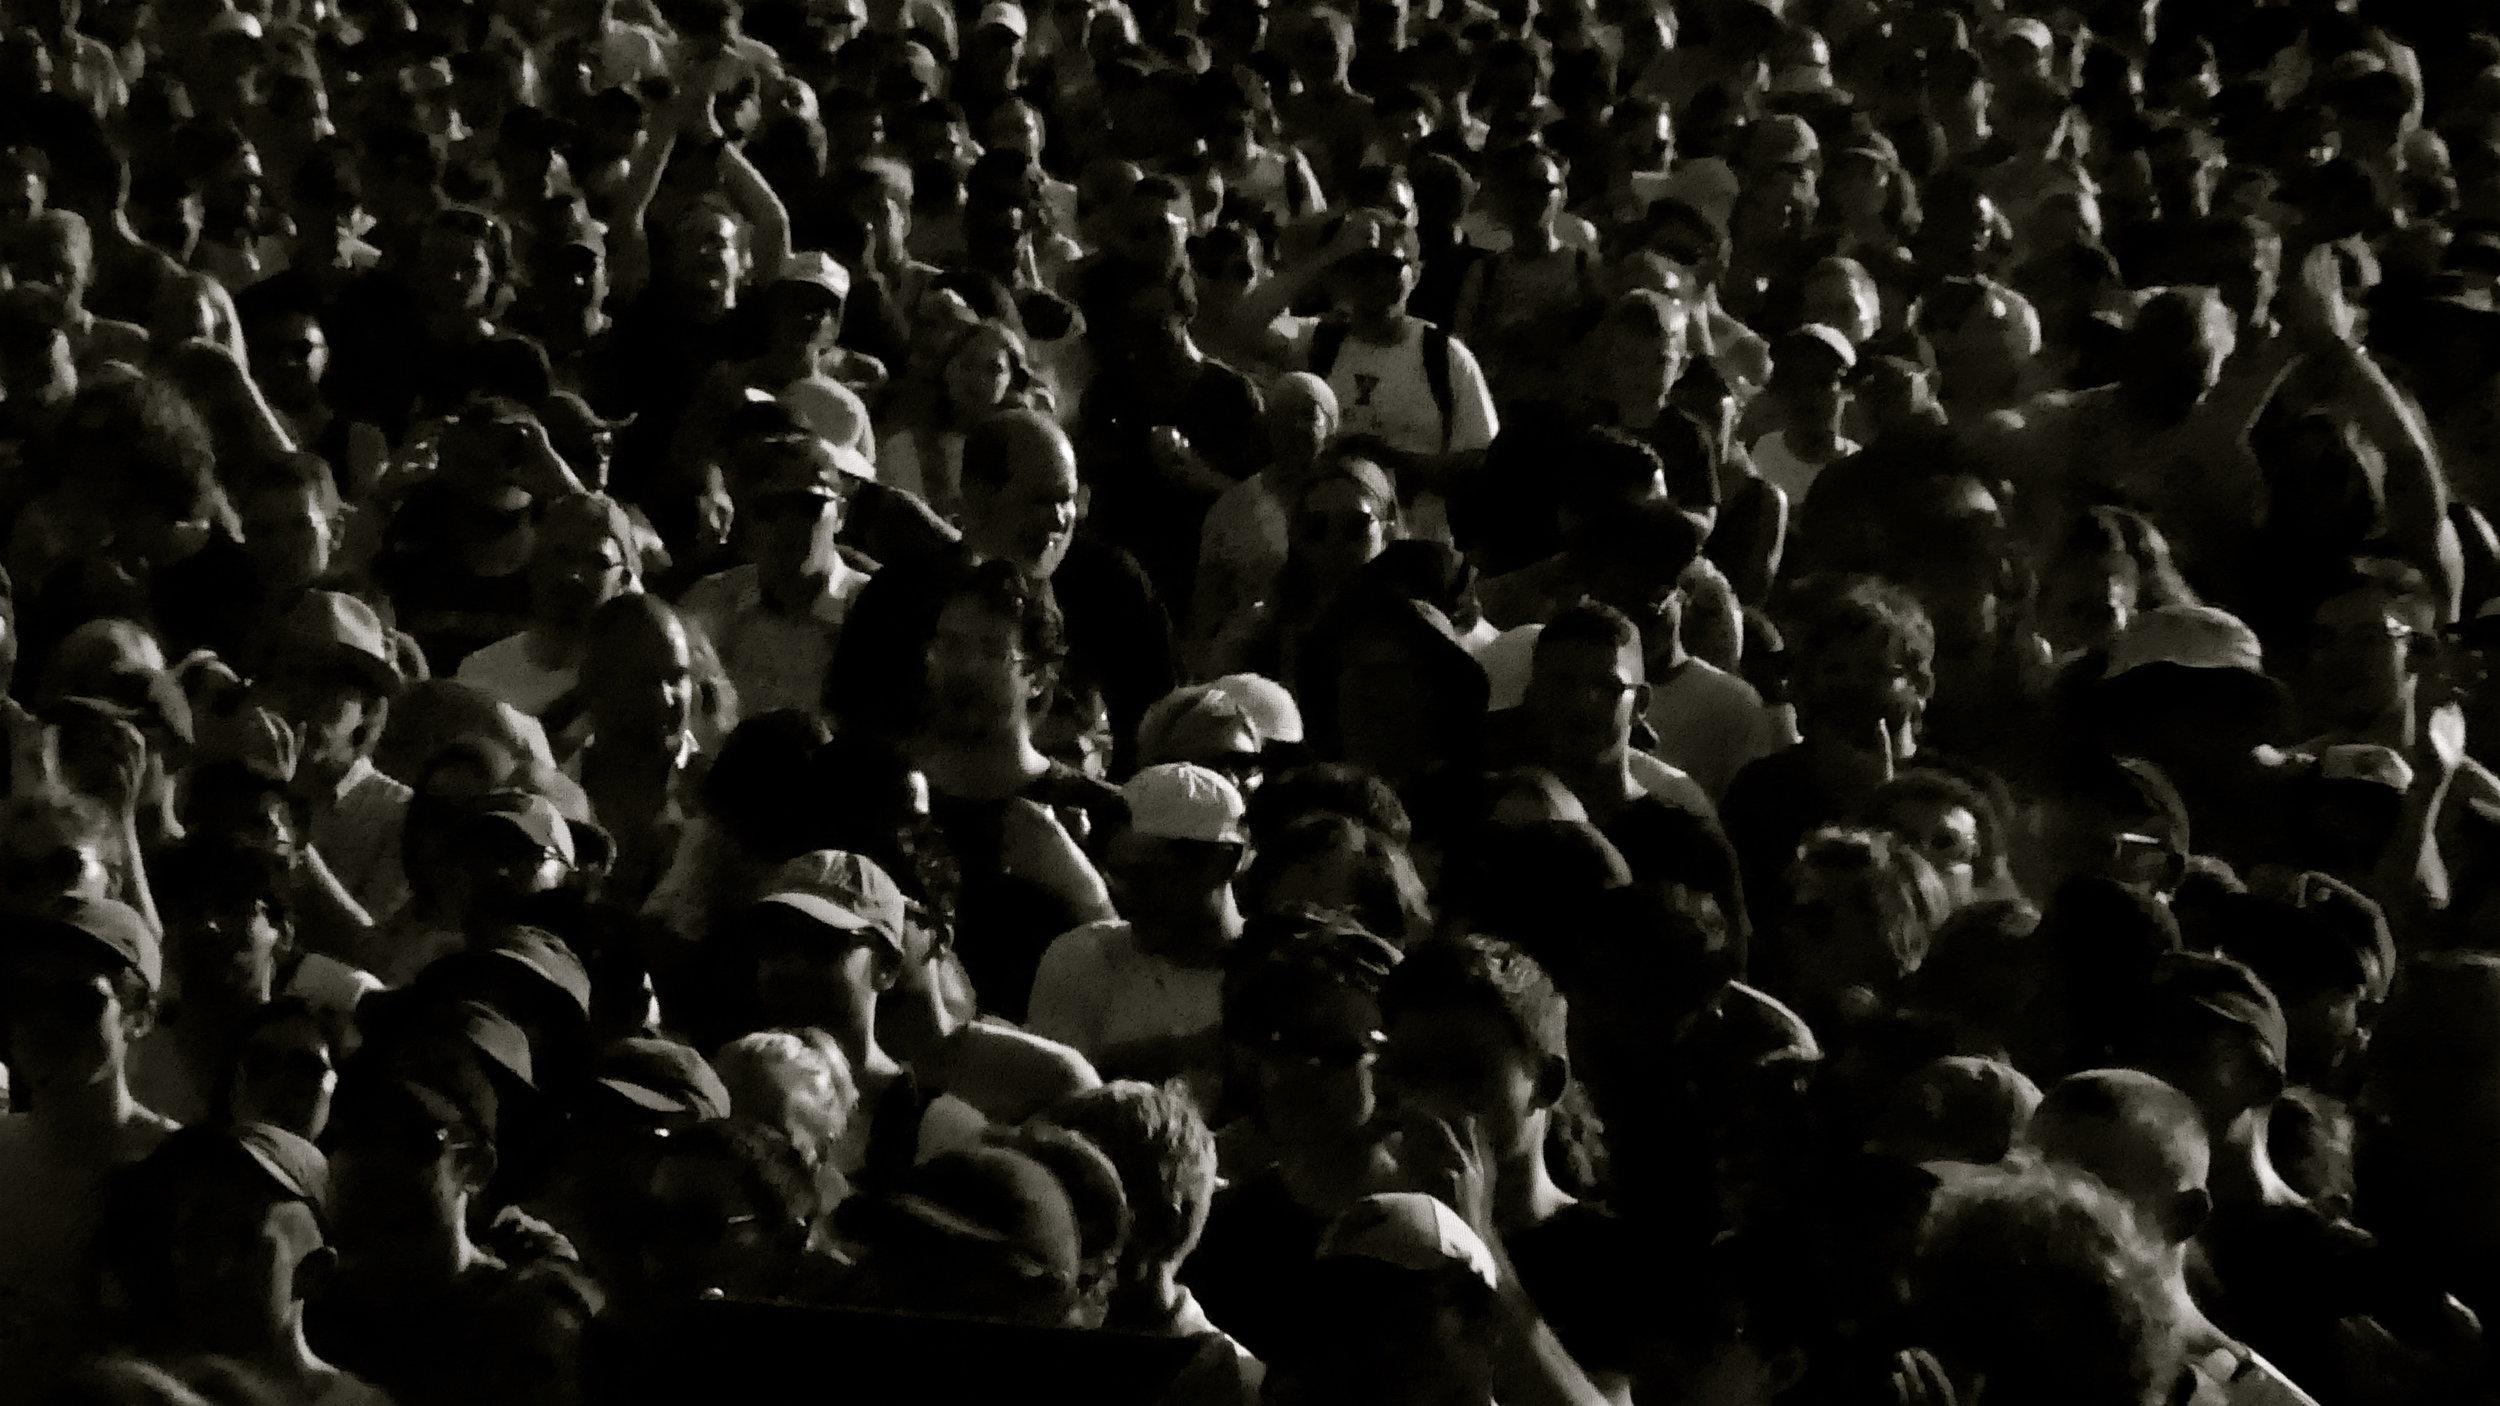 Stereolab live at Pitchfork Music Festival 2019 -09Multitud 2